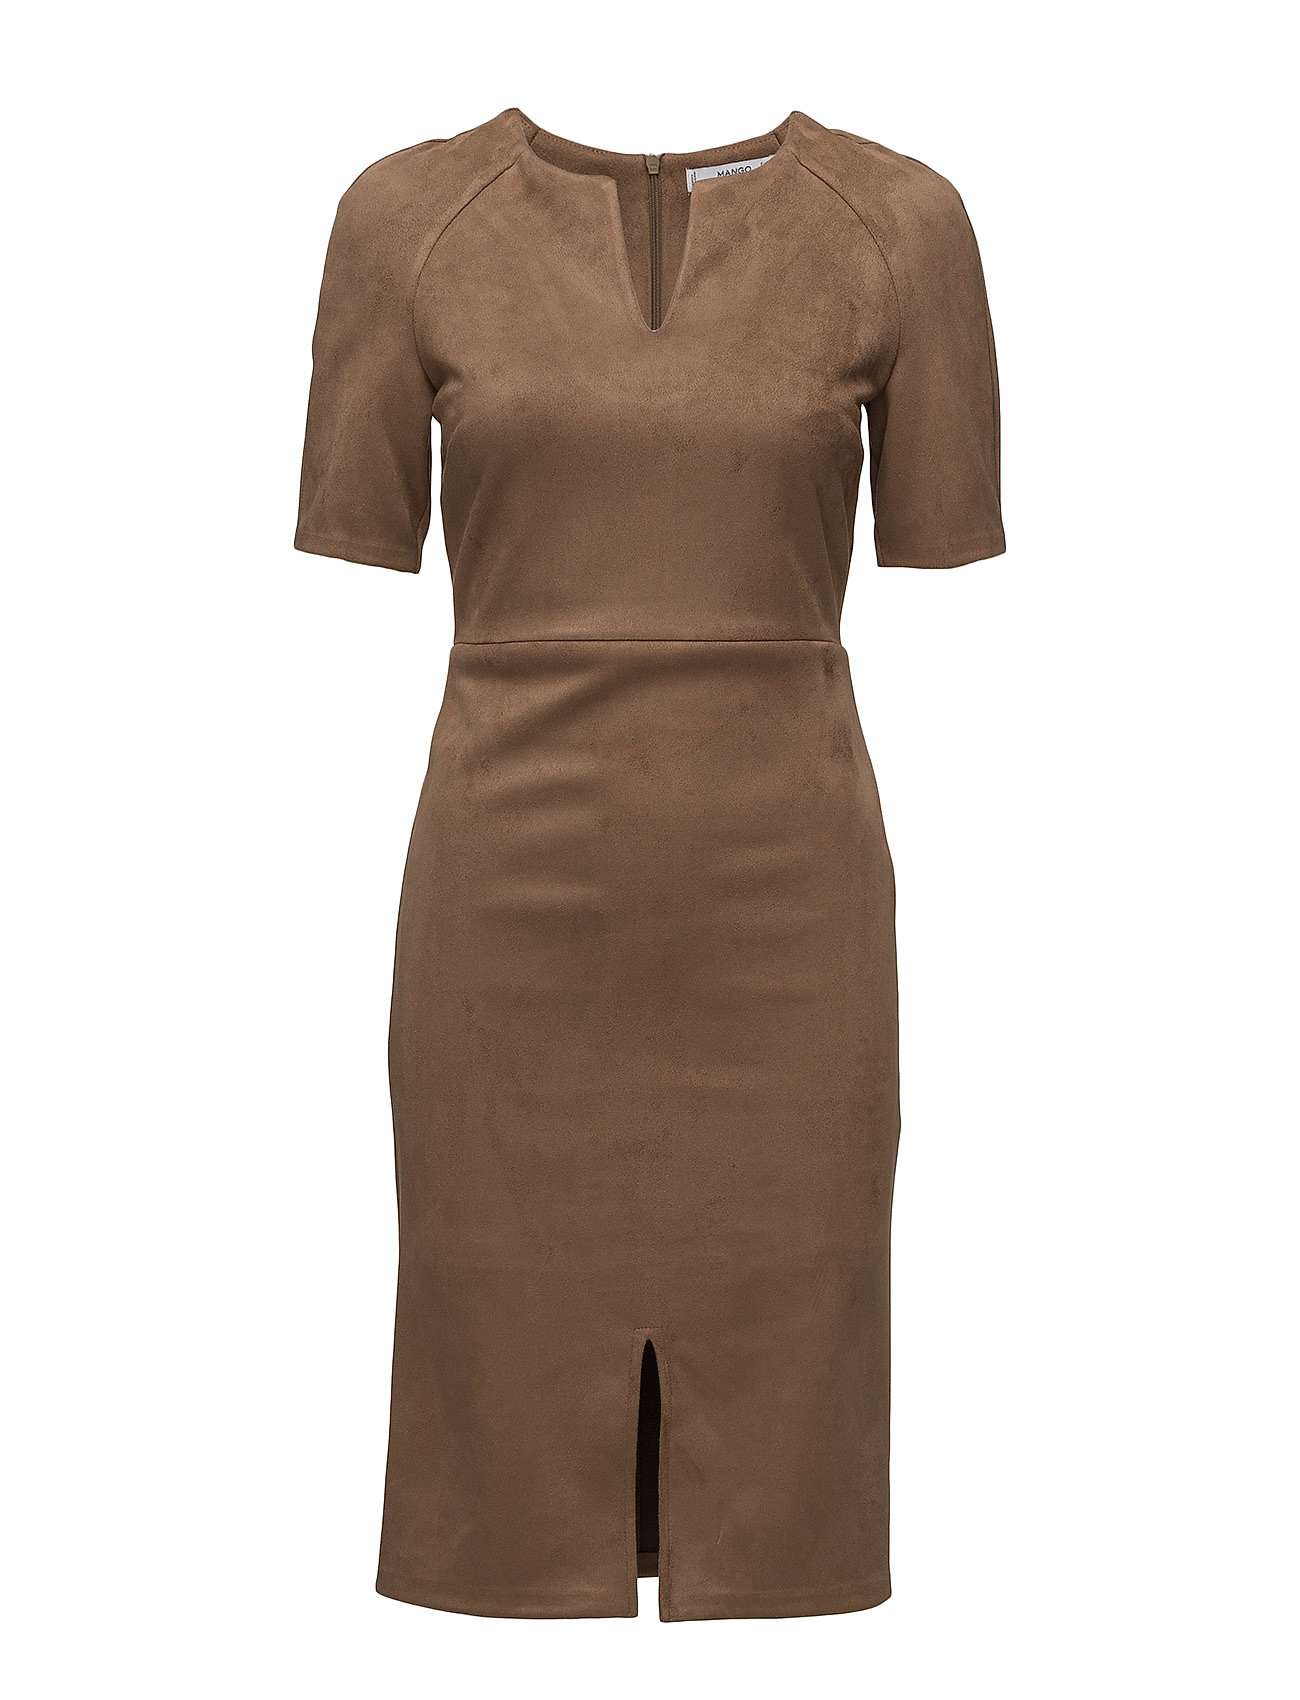 Soft Finish Dress